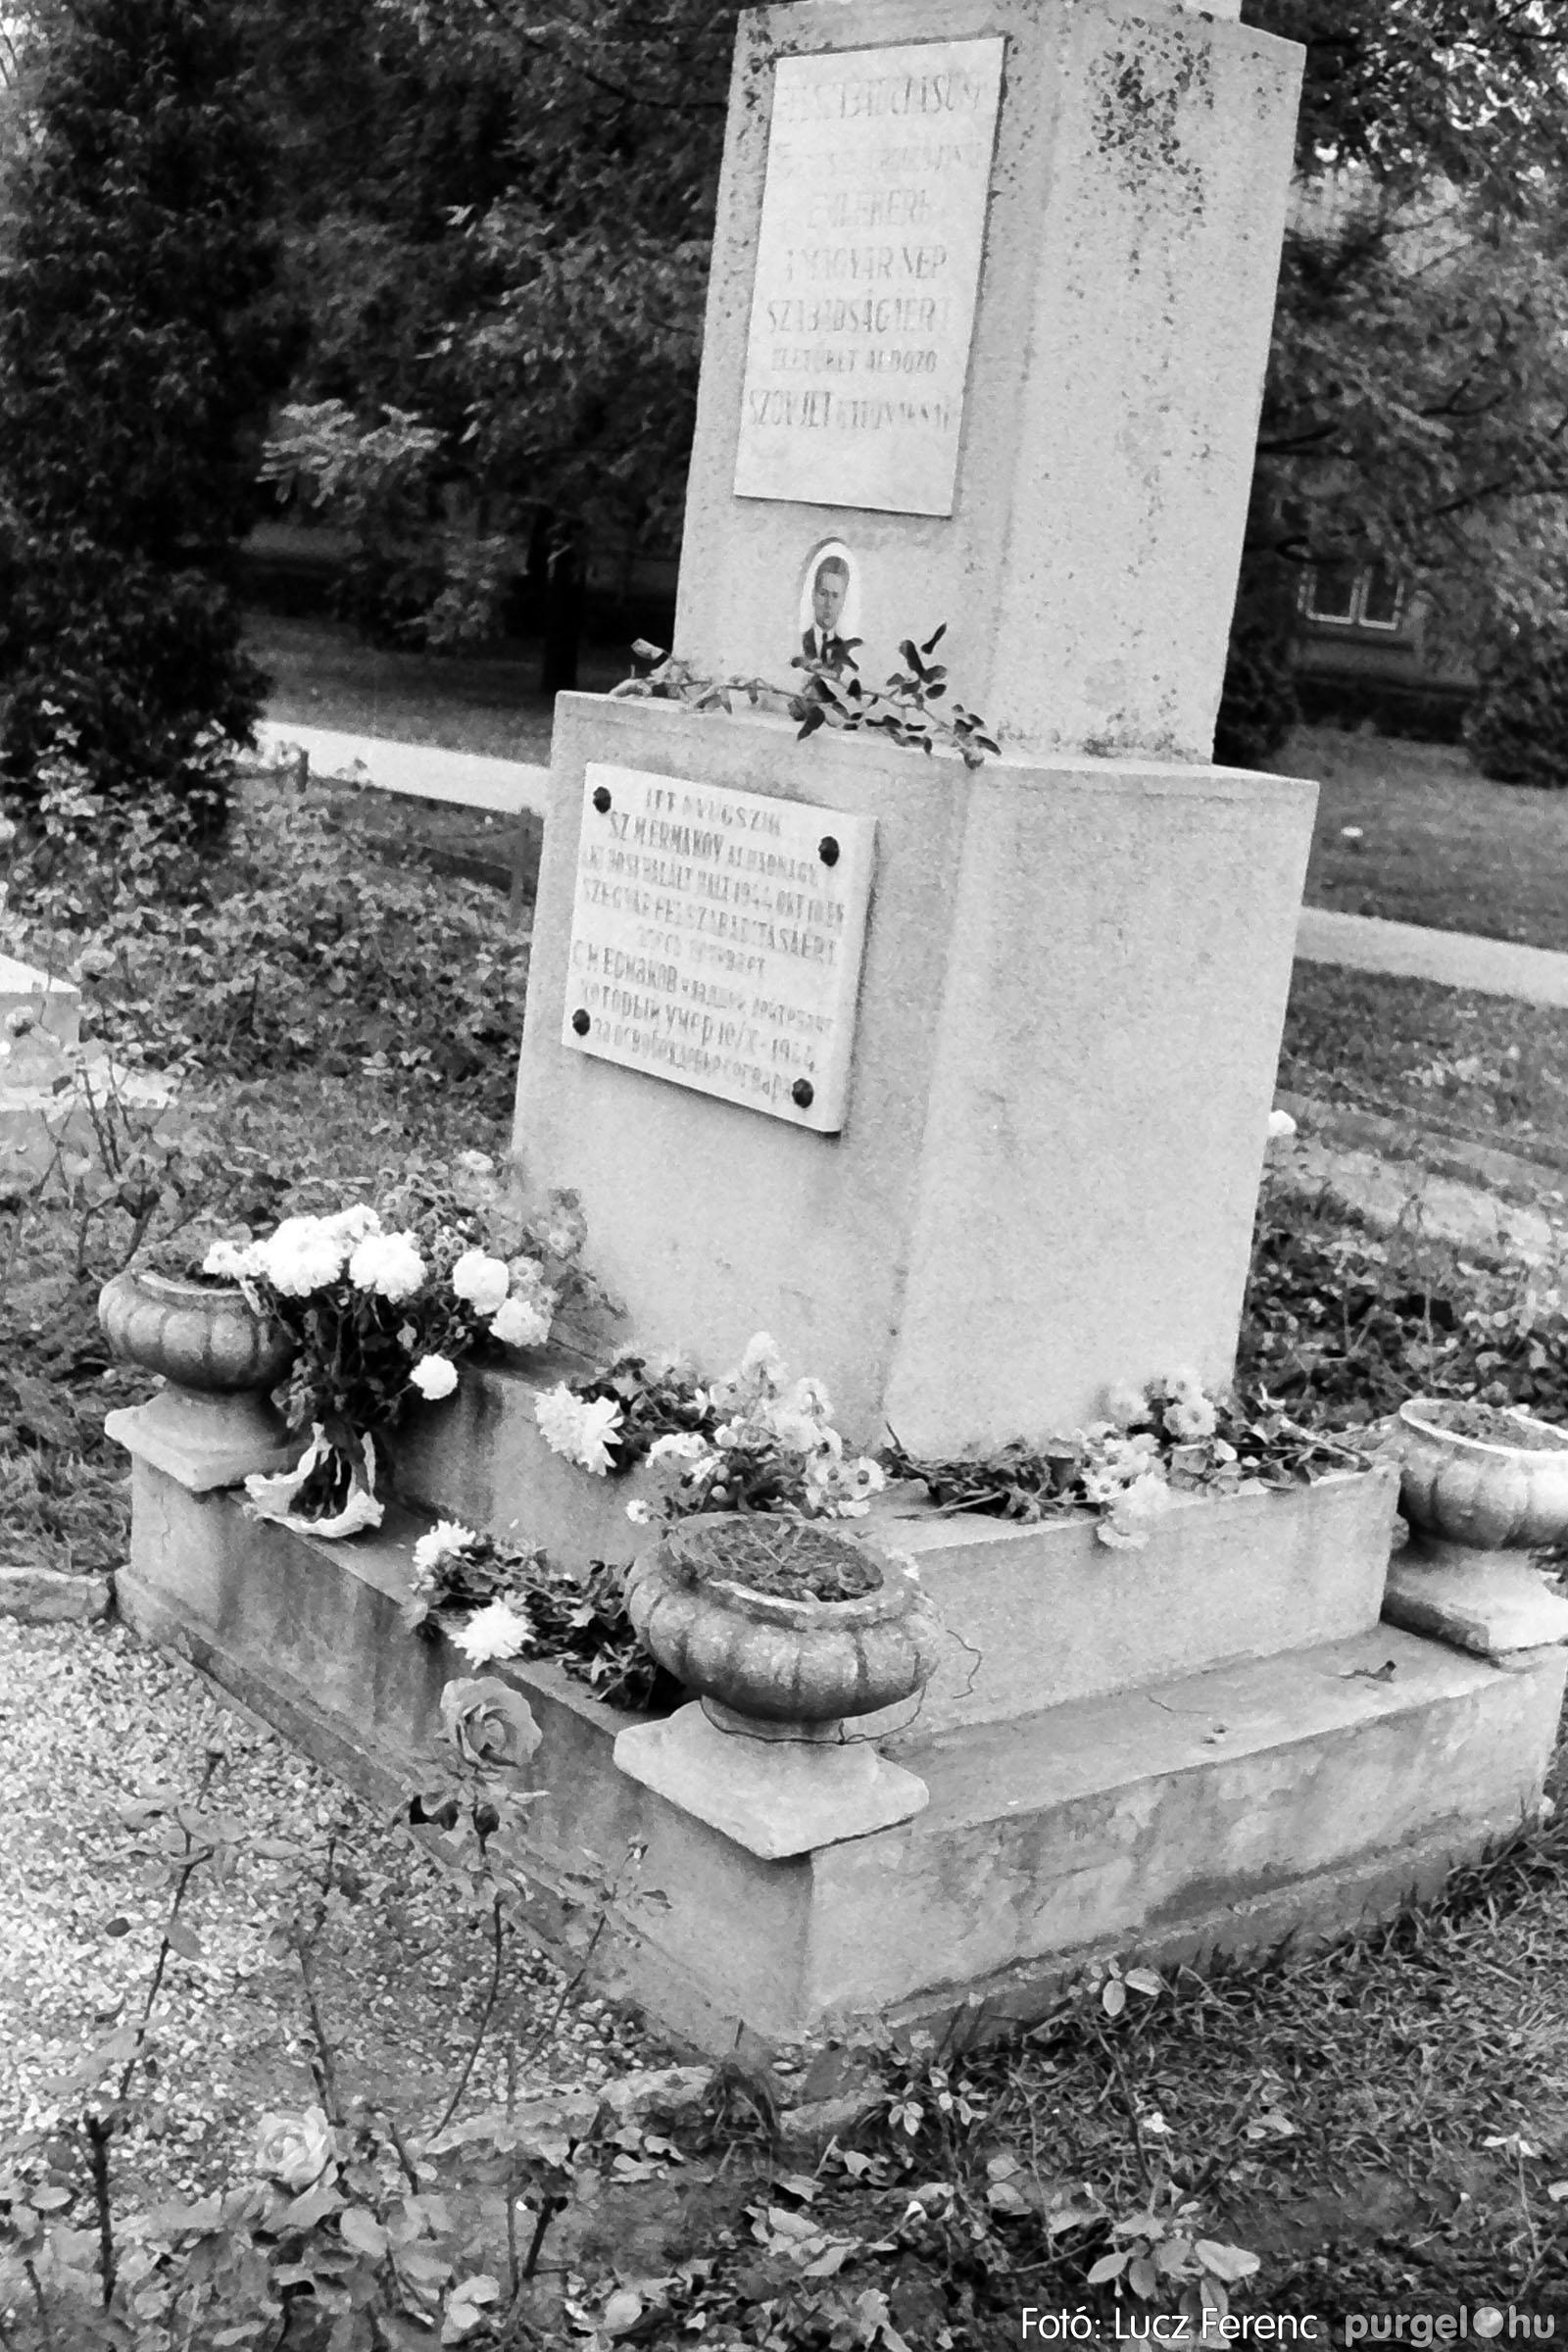 025 1975.10. Szovjet katonai emlékmű 001 - Fotó: Lucz Ferenc IMG00229q.jpg